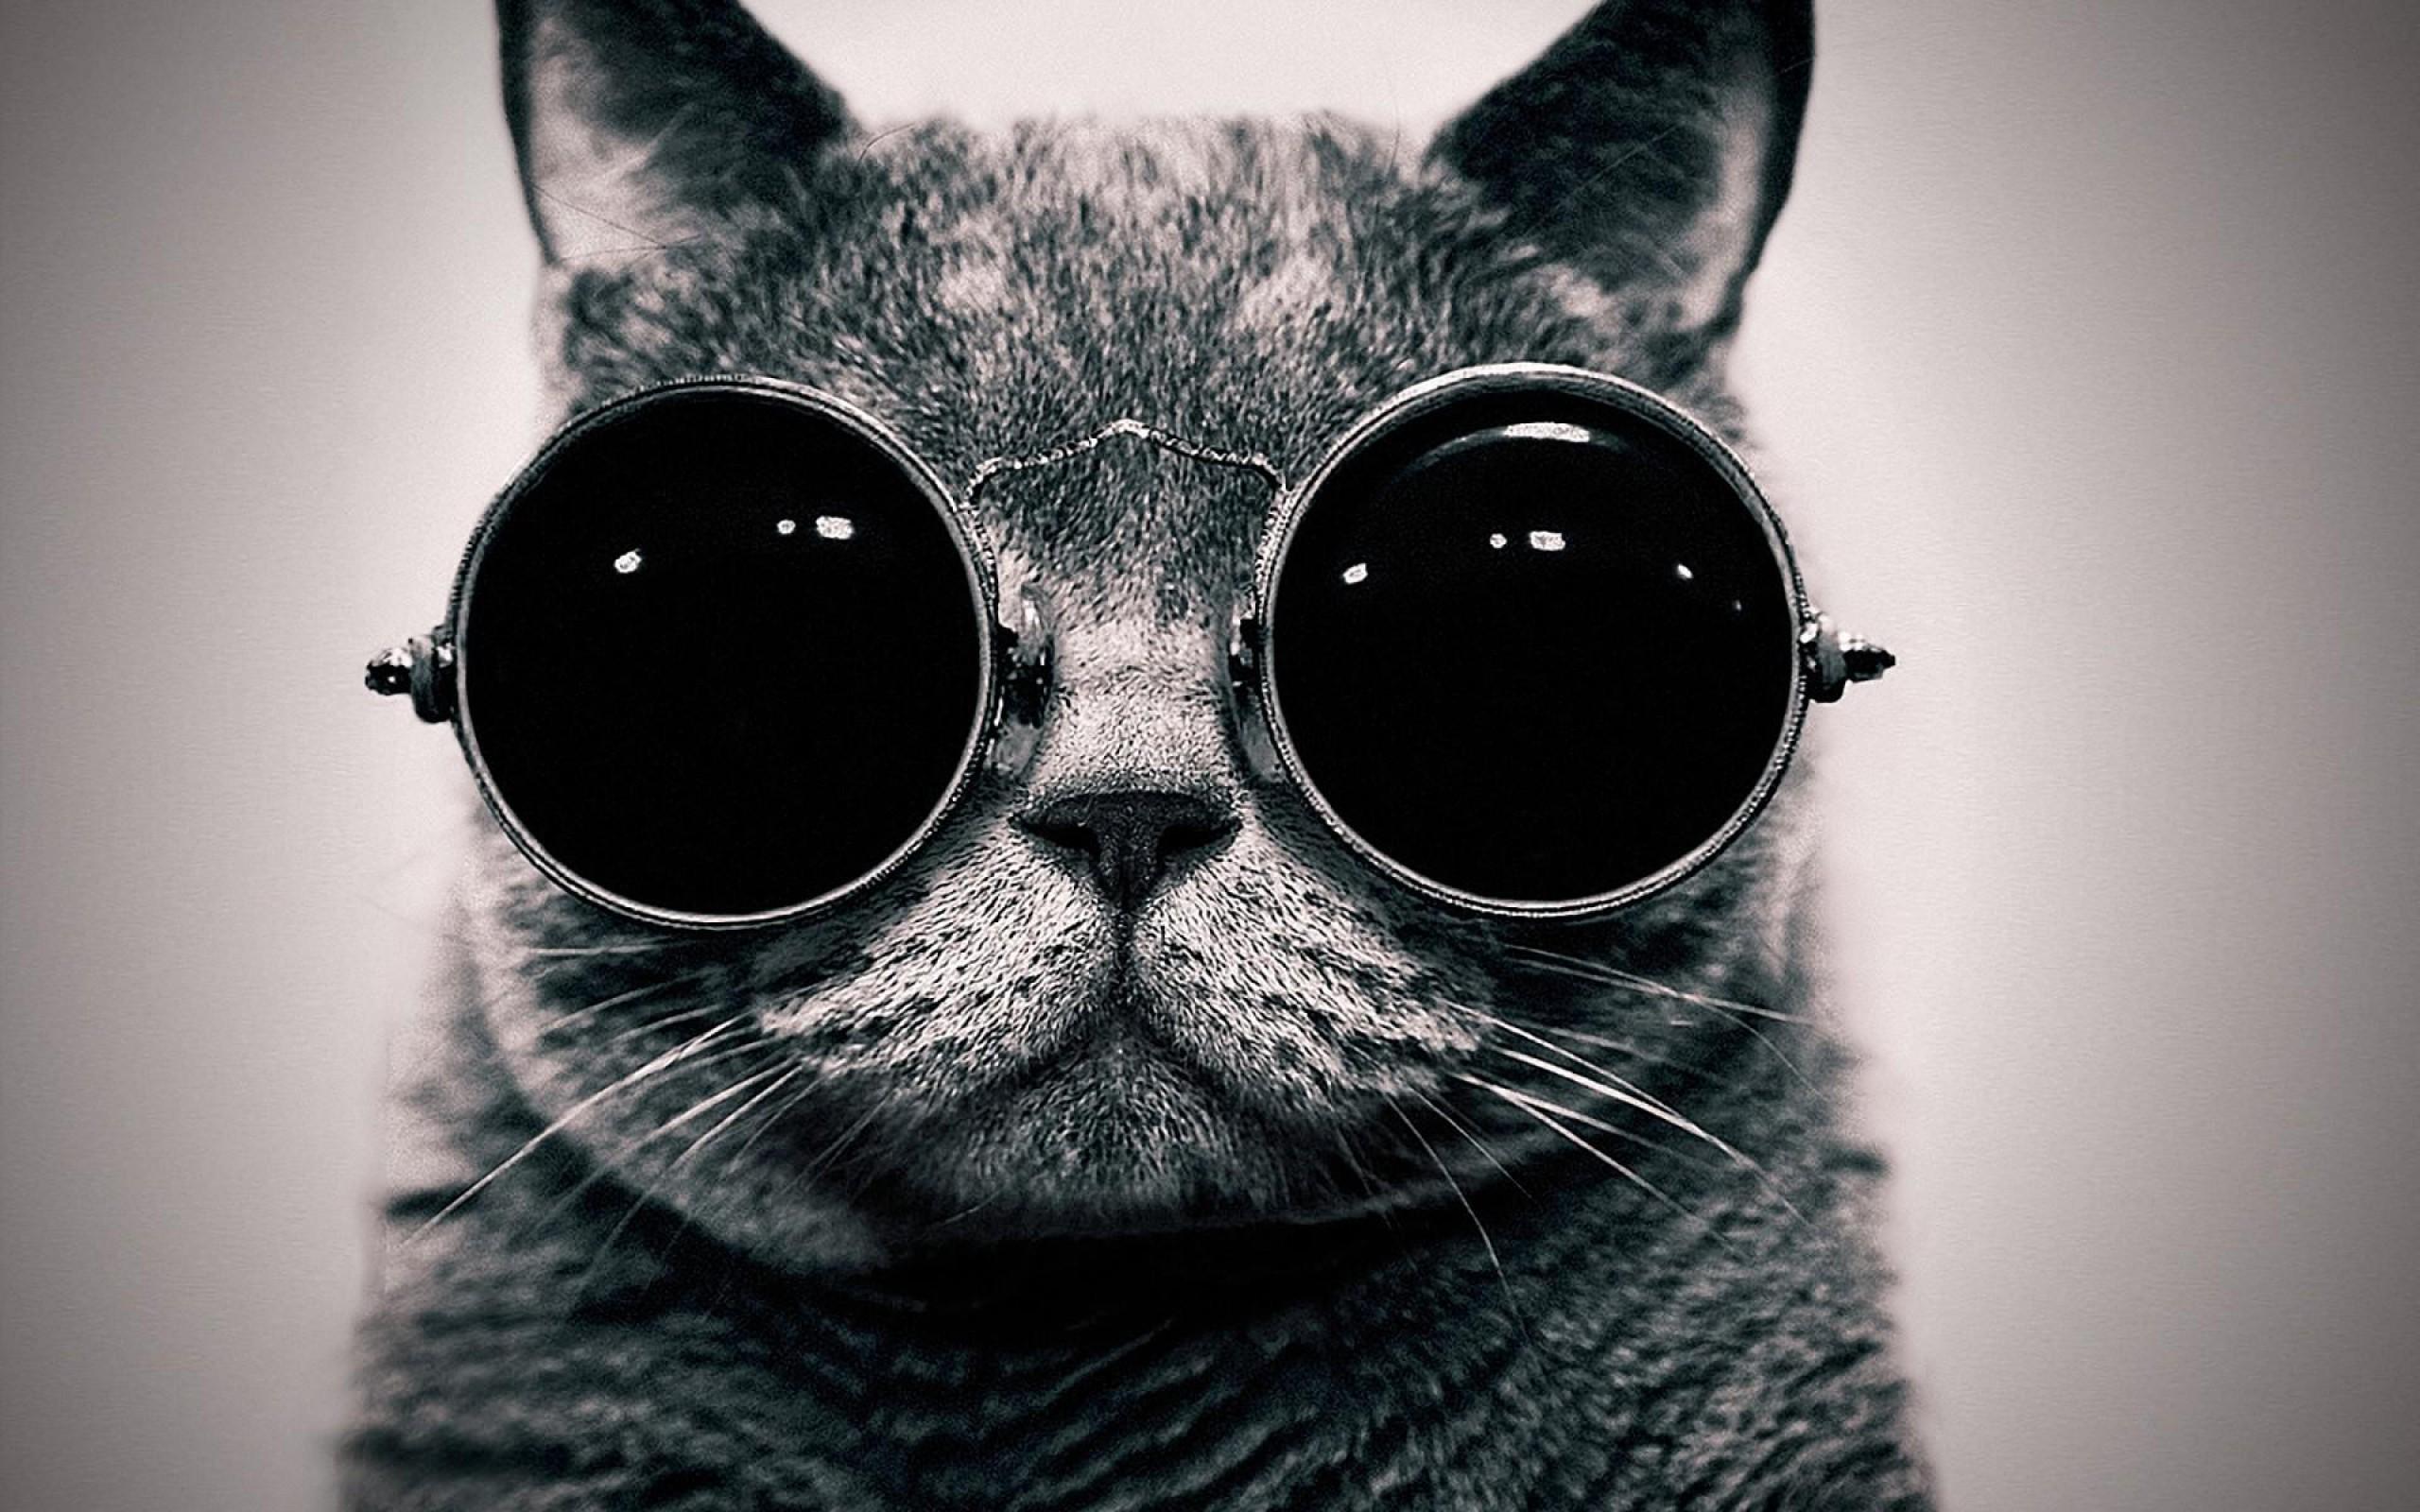 Cute Cat With Sunglasses HD Wallpaper 2560x1600